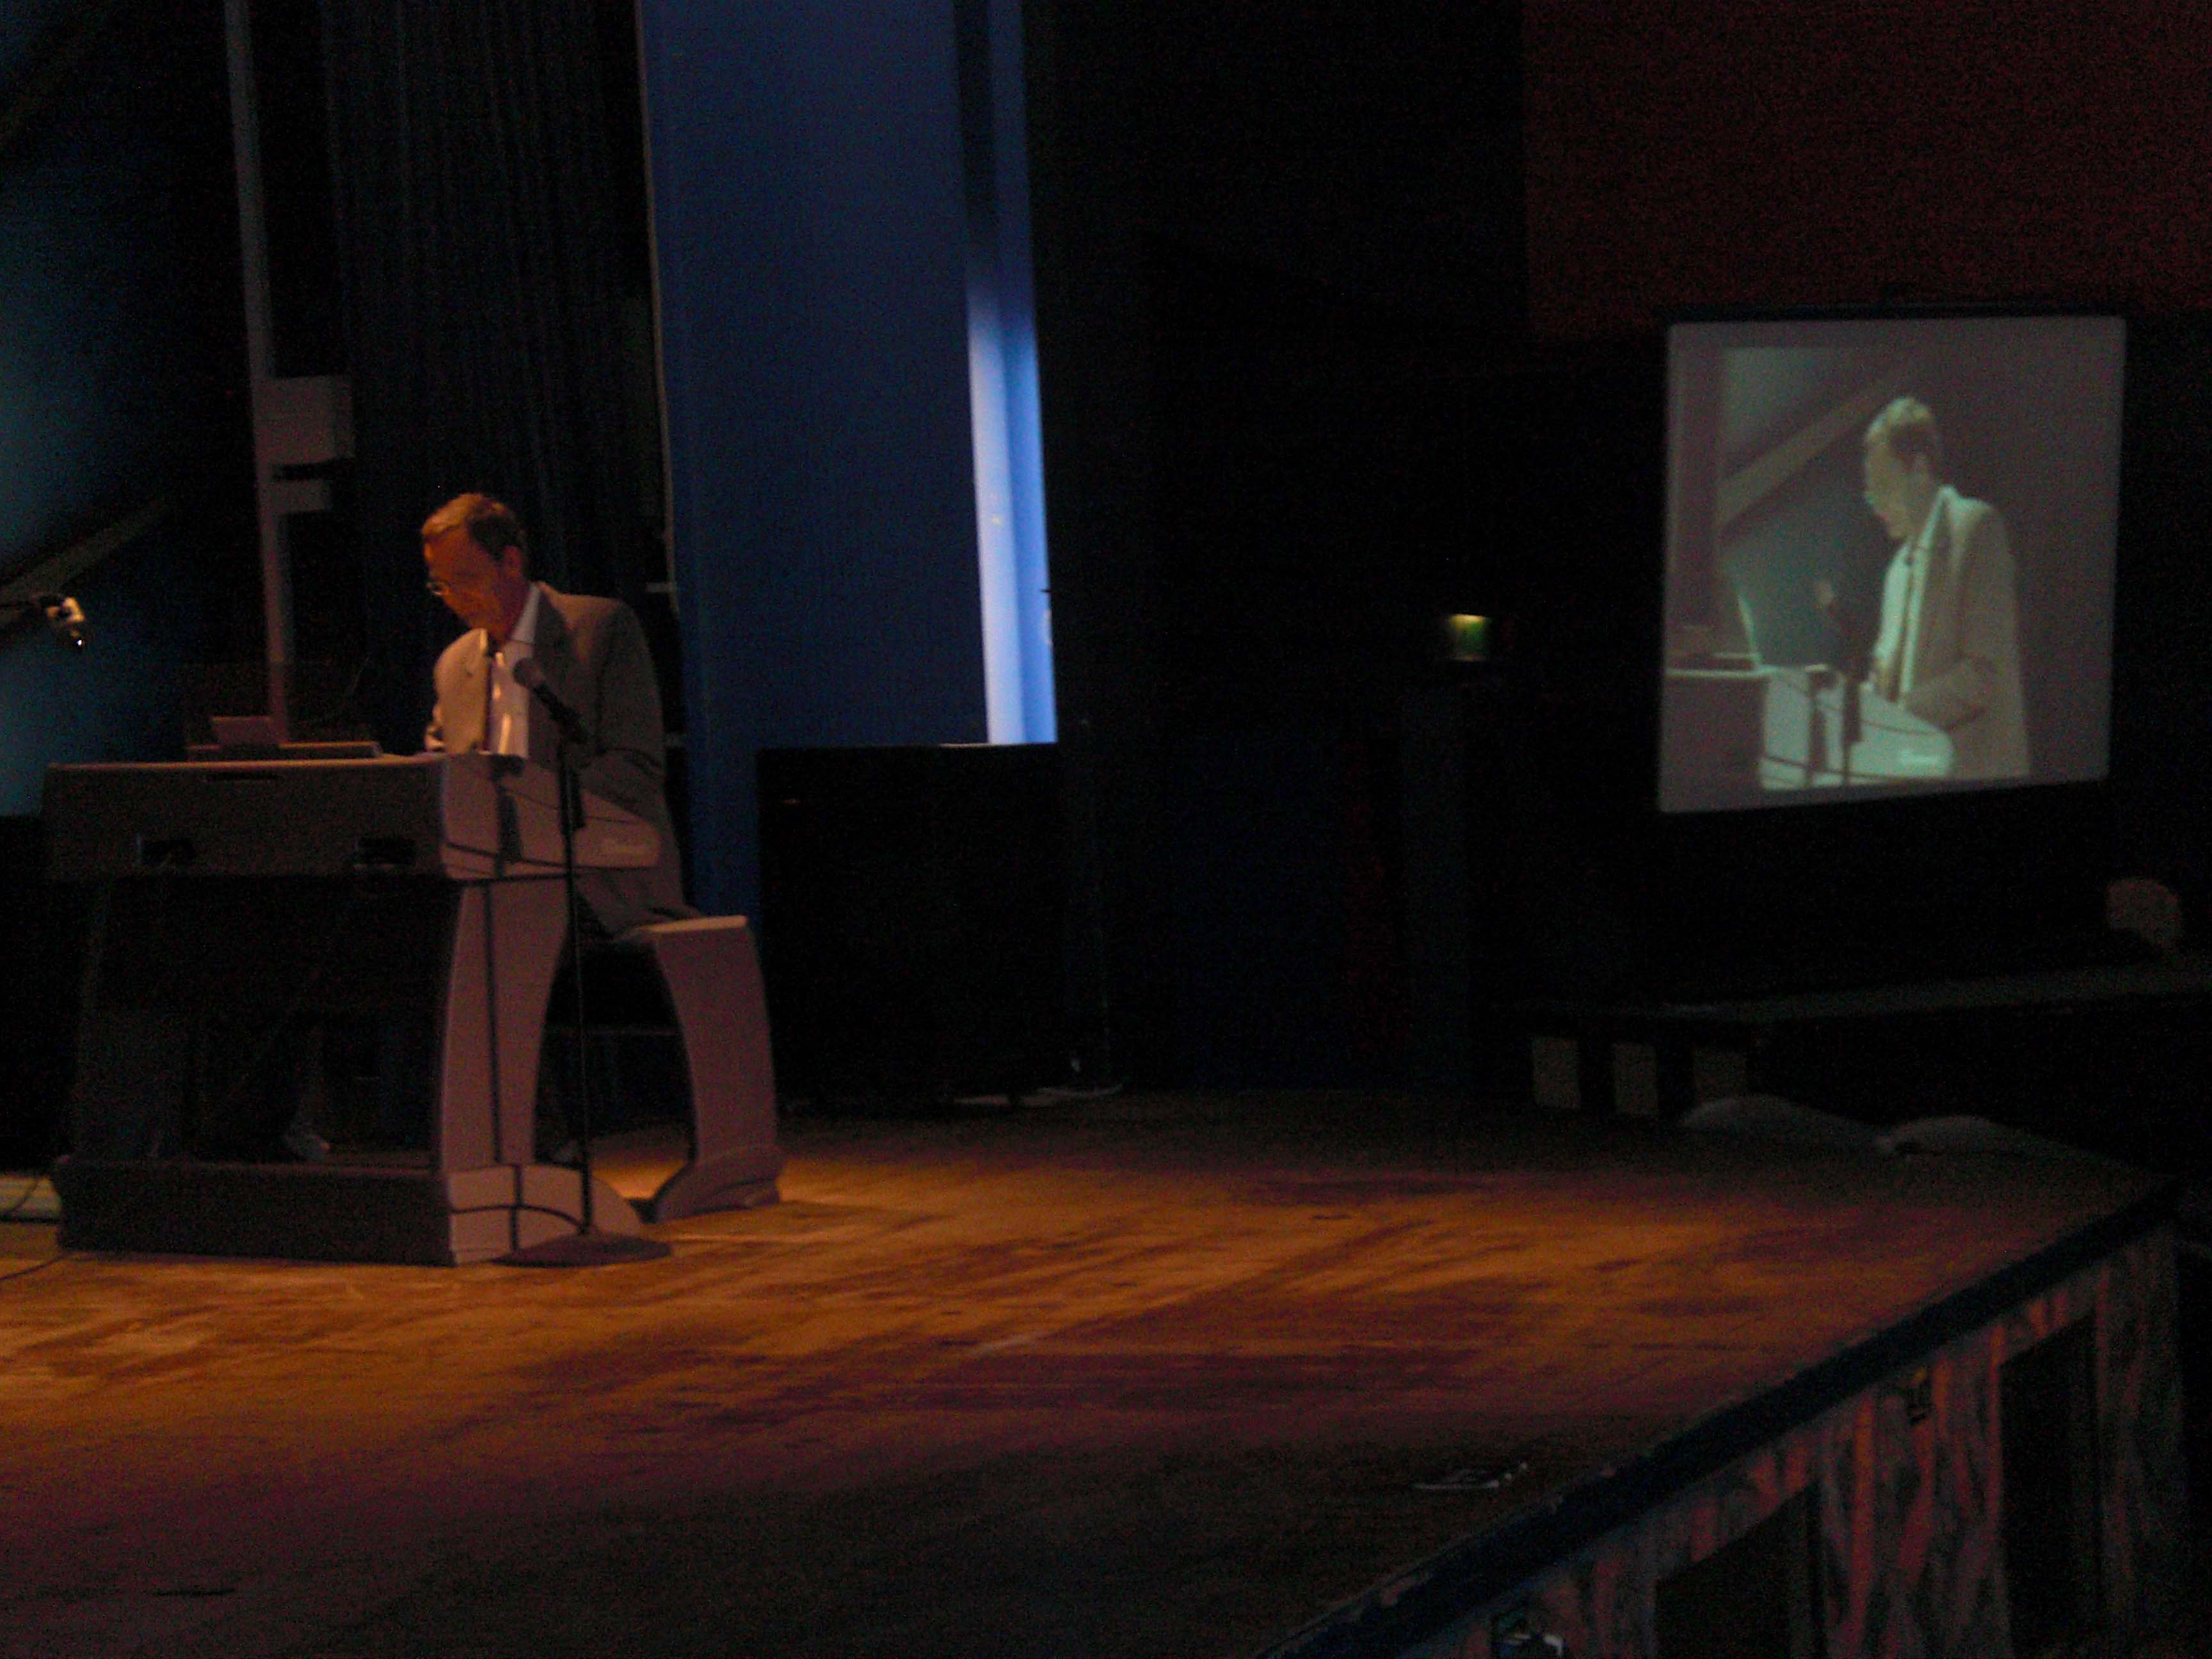 http://www.thomas-music.de/media/Pakefield_2011/CIMG1005.jpg